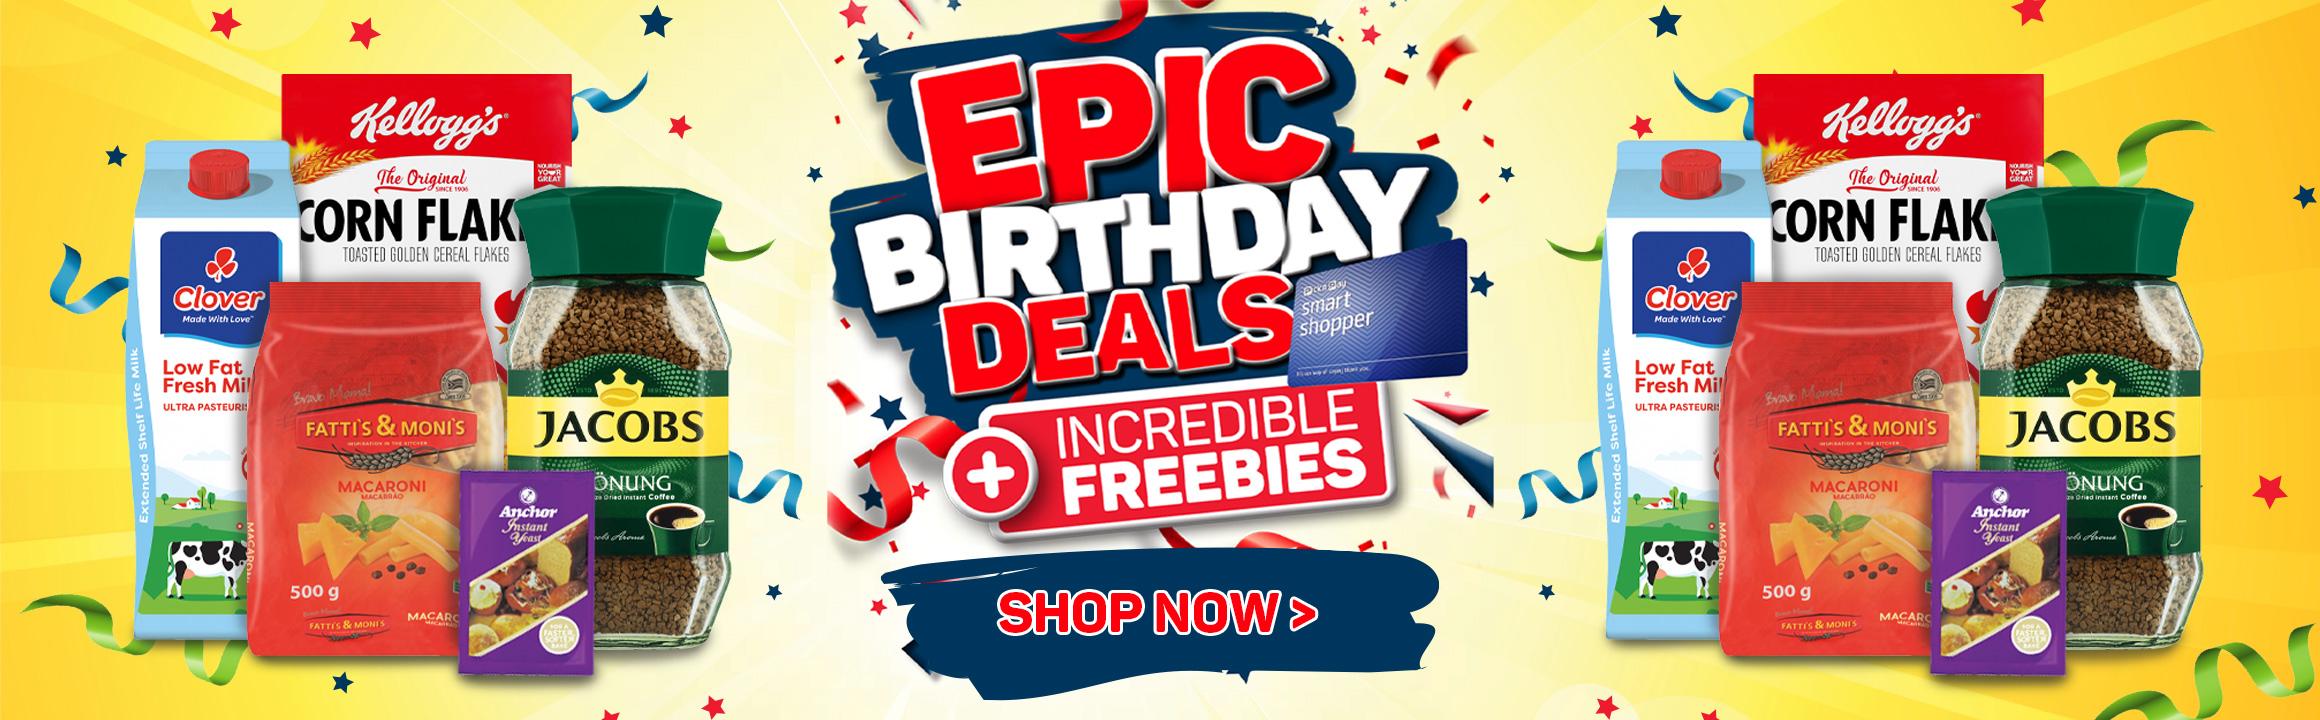 Epic Birthday deals + incredible freebies.